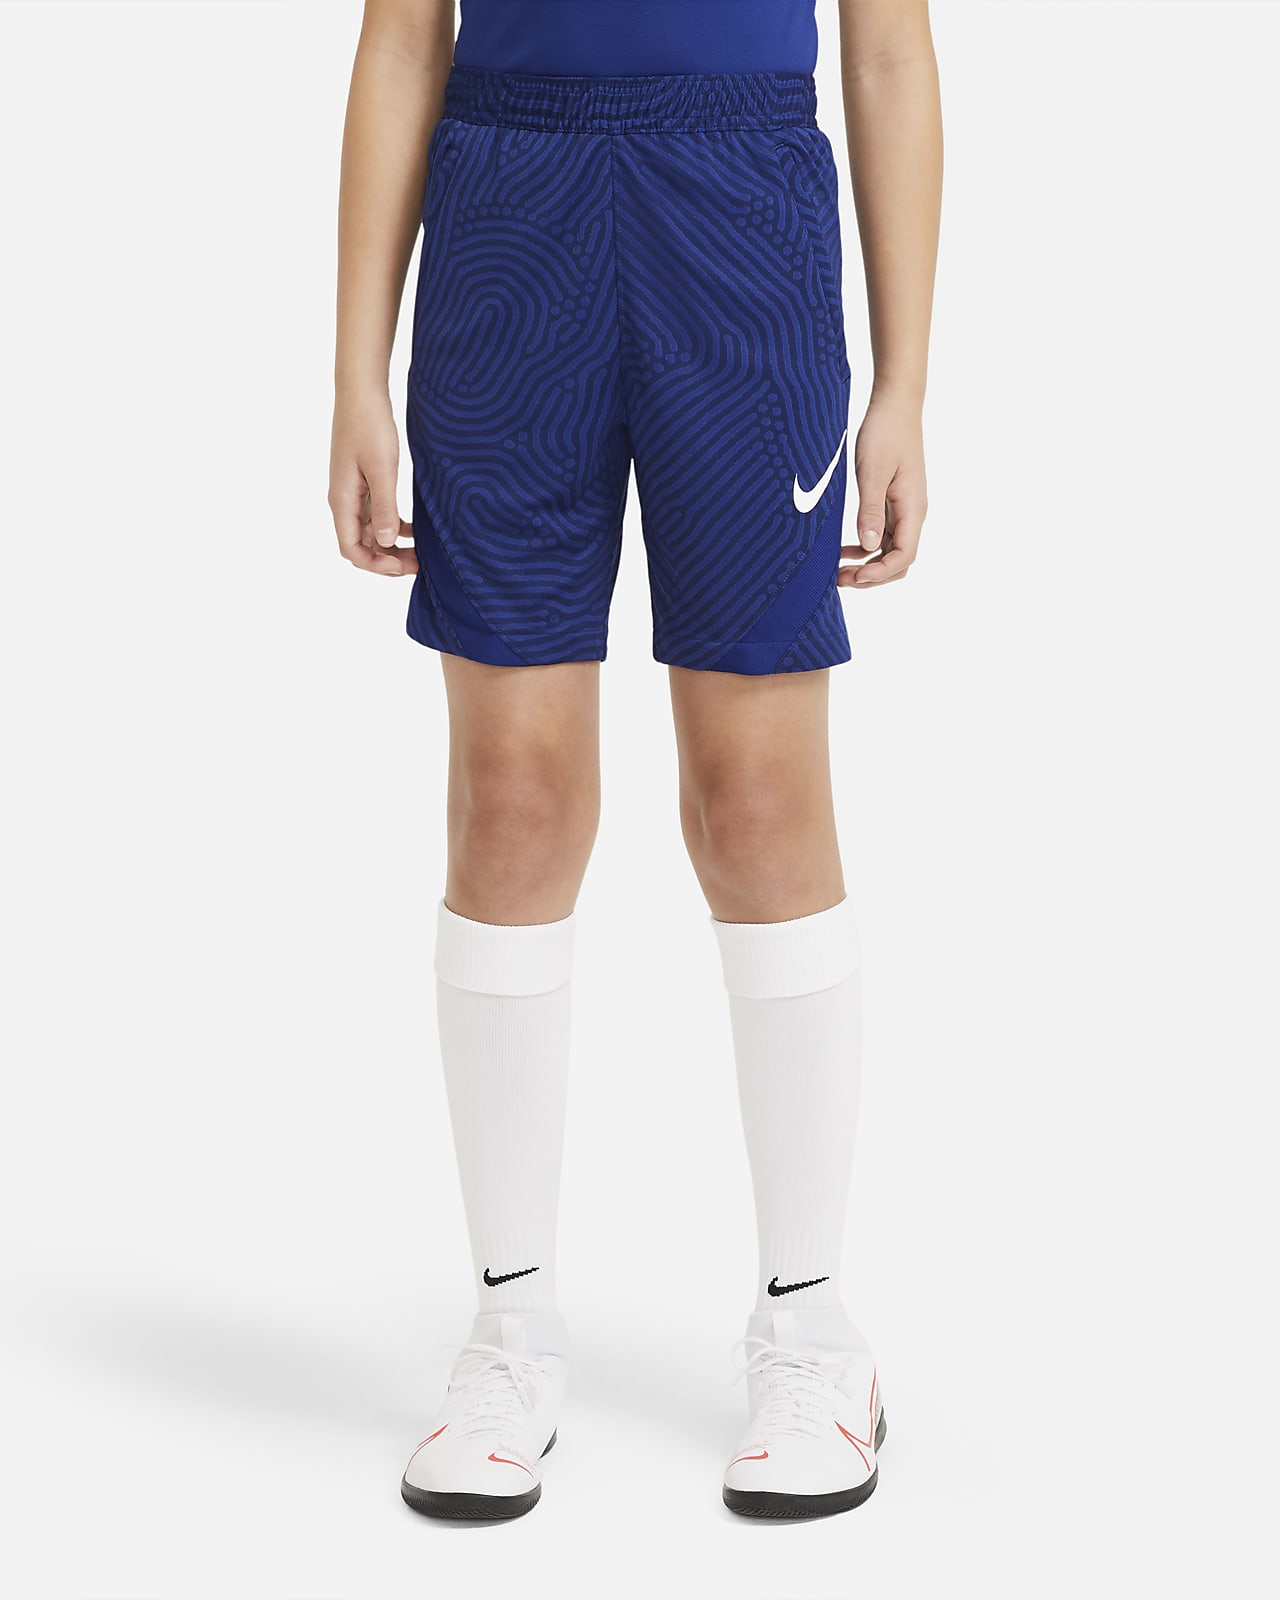 Nike Dri-FIT Strike Genç Çocuk Futbol Şortu